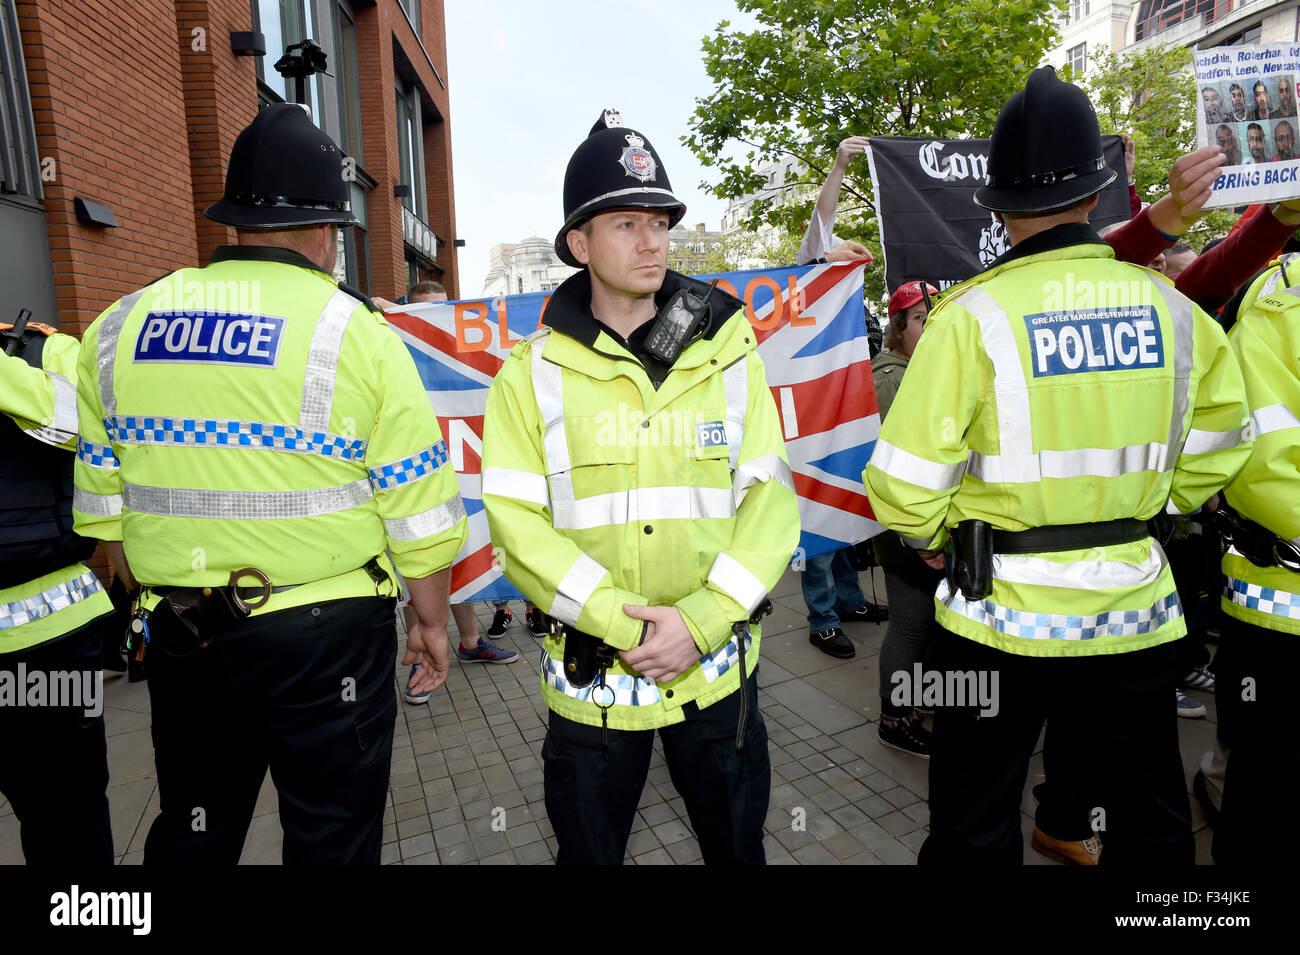 Racist demonstrators and police - Stock Image